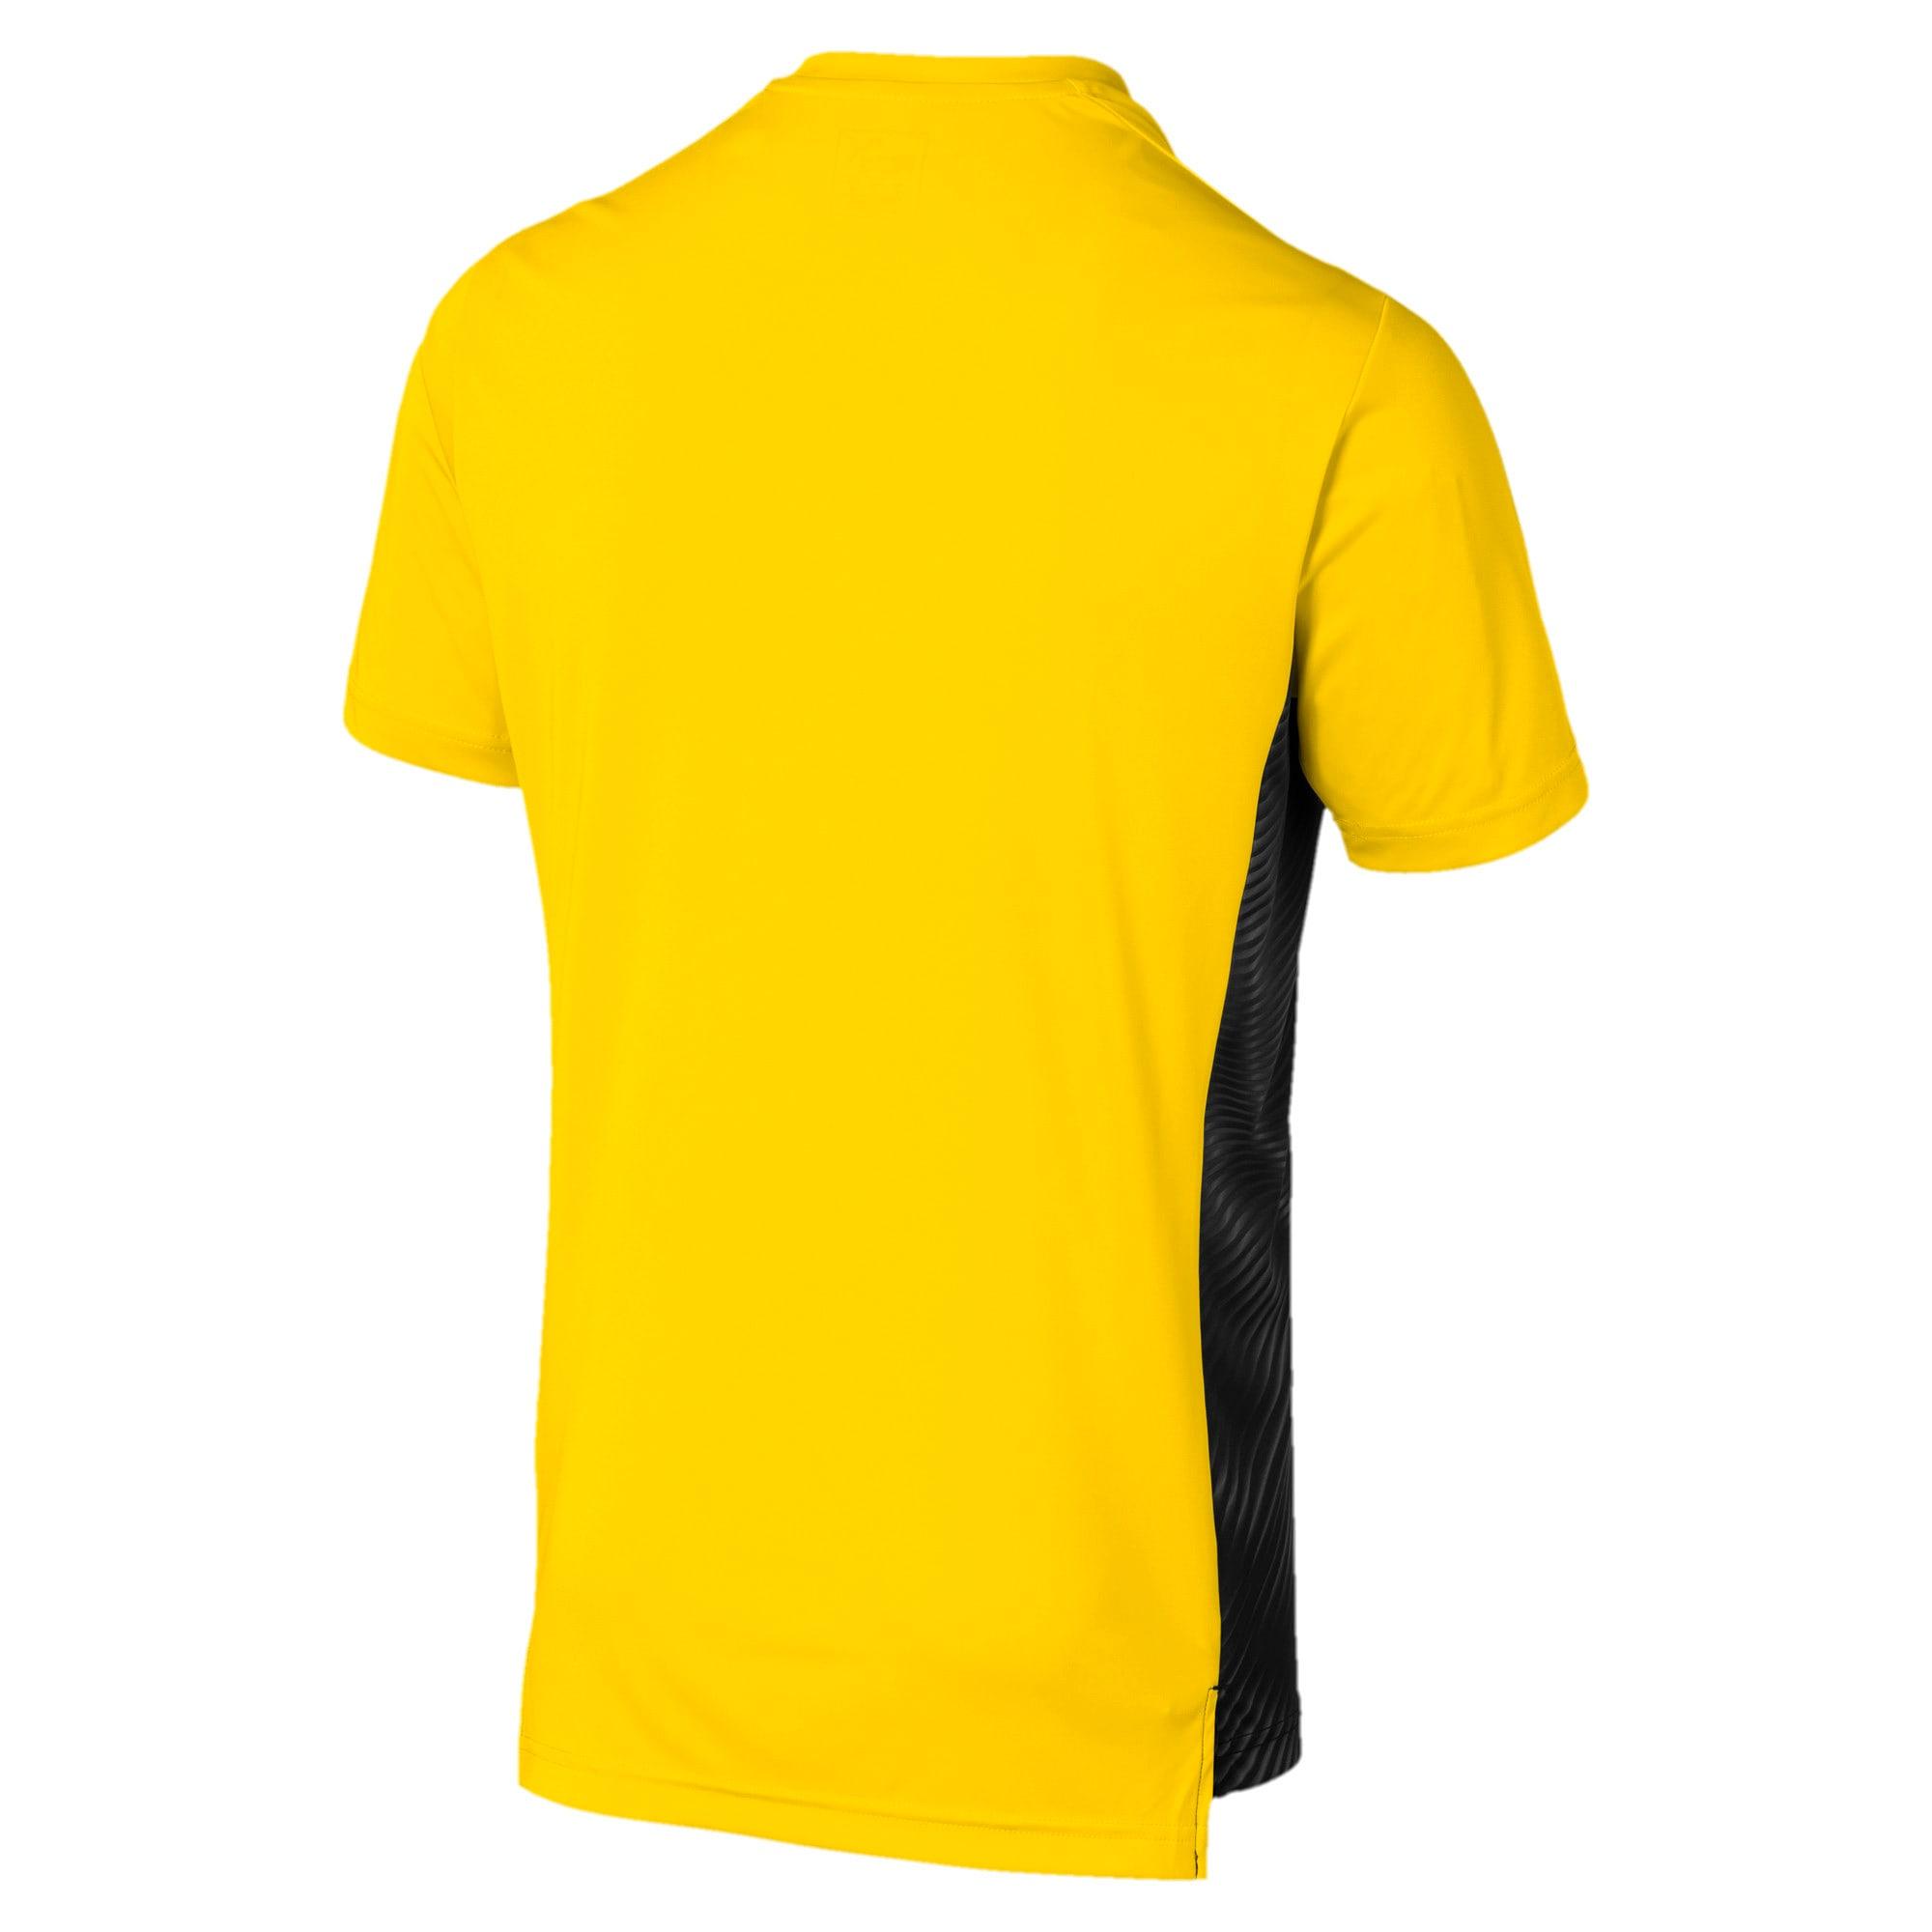 Thumbnail 2 of BVB Men's League Stadium Jersey, Cyber Yellow-Puma Black, medium